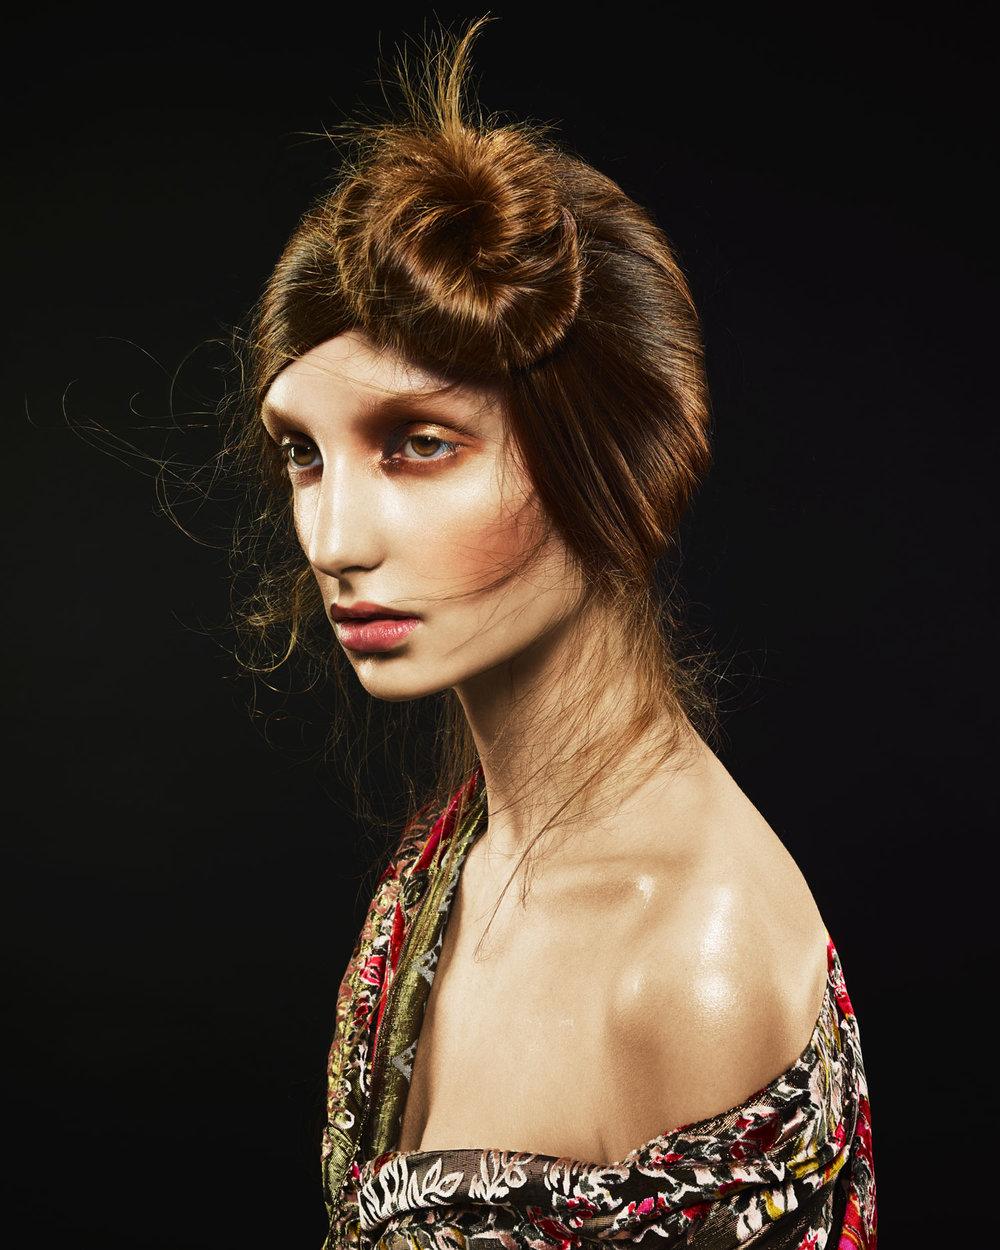 sarah-cochran-wardrobe-stylist-minneapolis-st-paul-creative-stylist-1.jpg